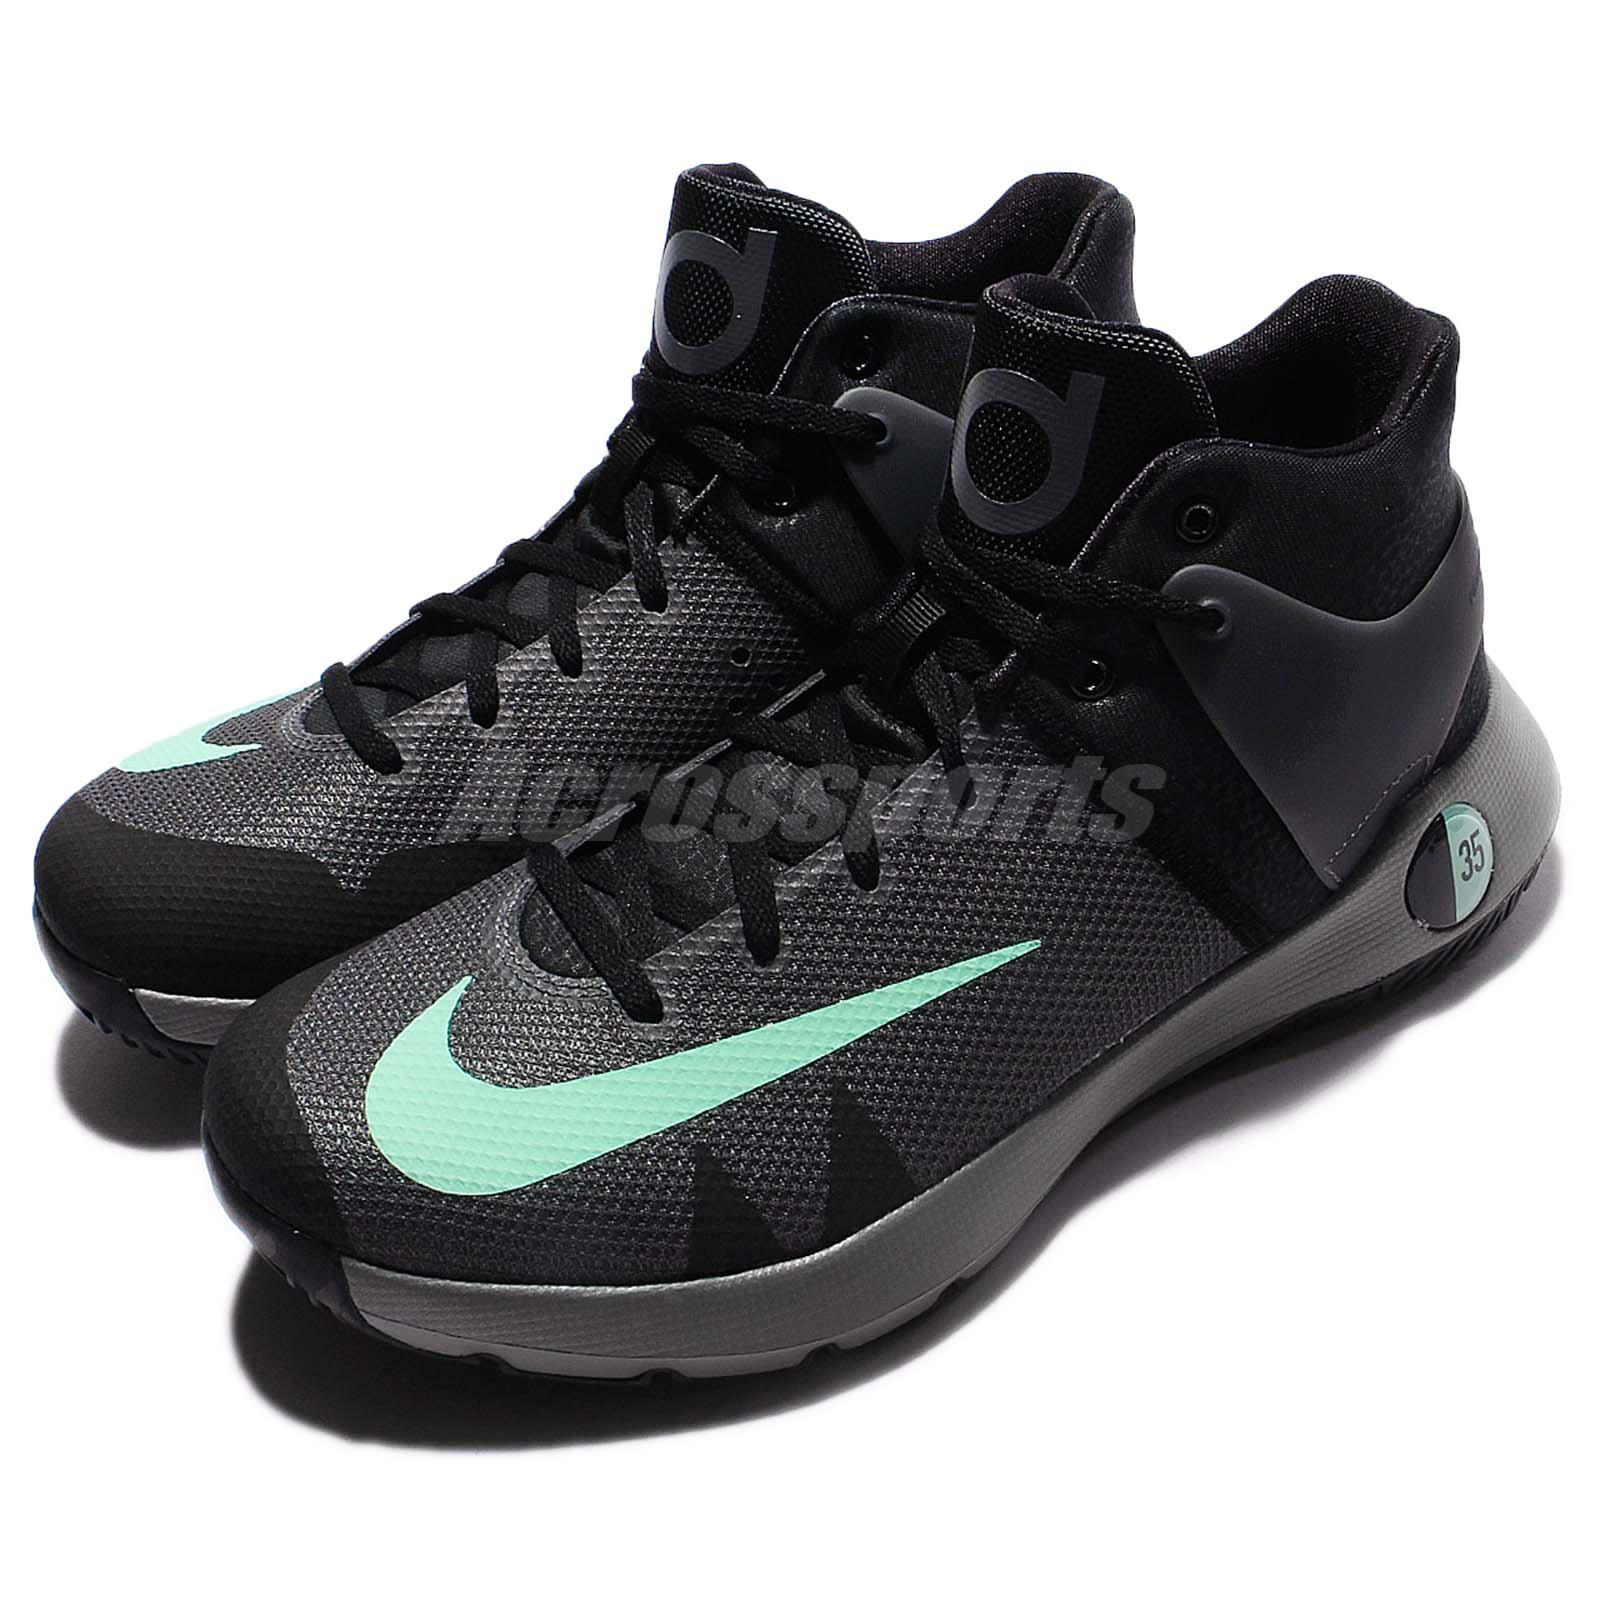 6648c56c8b61 Nike Kd Trey 5 Ii Price Philippines